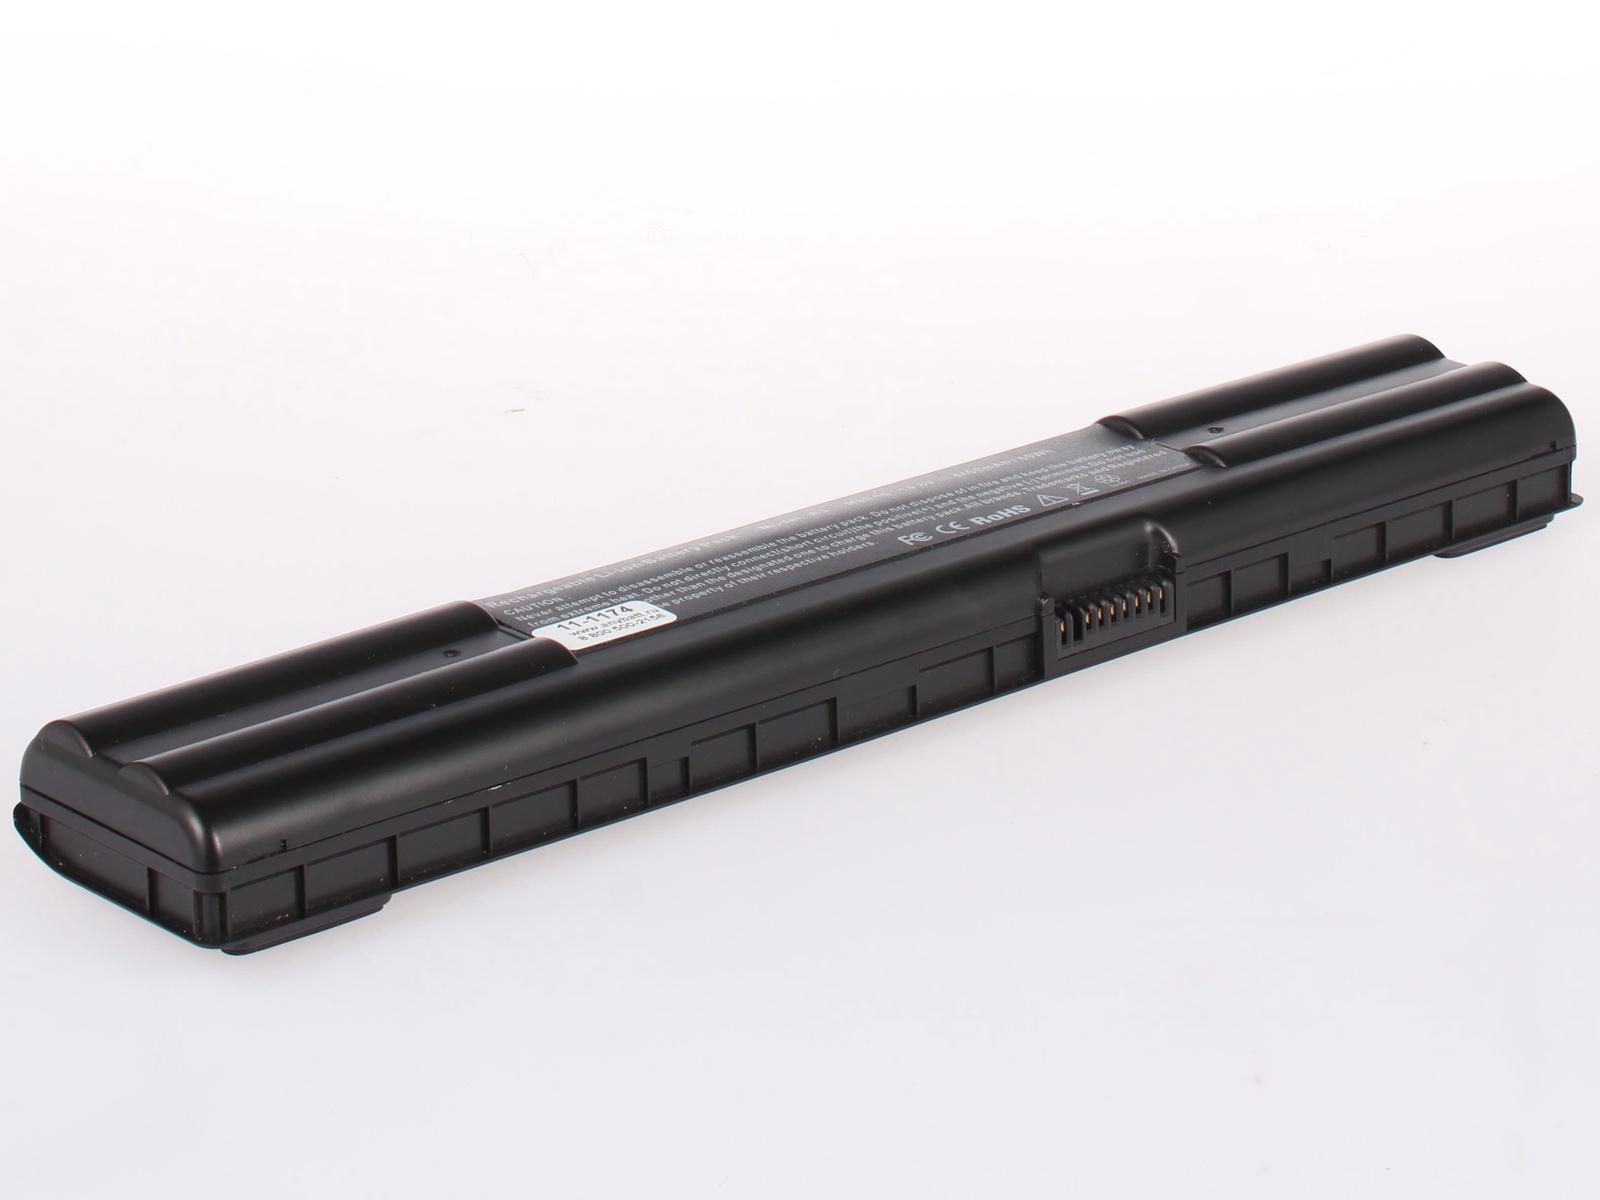 Аккумулятор для ноутбука AnyBatt для Asus A3000, A6R, G2S, G1S, A7V, A6M, A7U, A3A, A7M, A3L, A6J, A6G, A3E, A3N, A3F, A7J, A6T, A3H, A6Rp, Z9100, A6K, A7Sv, A7D, Z81, A7T, A3G, A3500L, A3V, G1Sn, A7C, A7G, G2Sg, G2P, A7SN, Z9000 1000pcs transistor mpsa 42 mpsa42 a42 mps a42 to 92